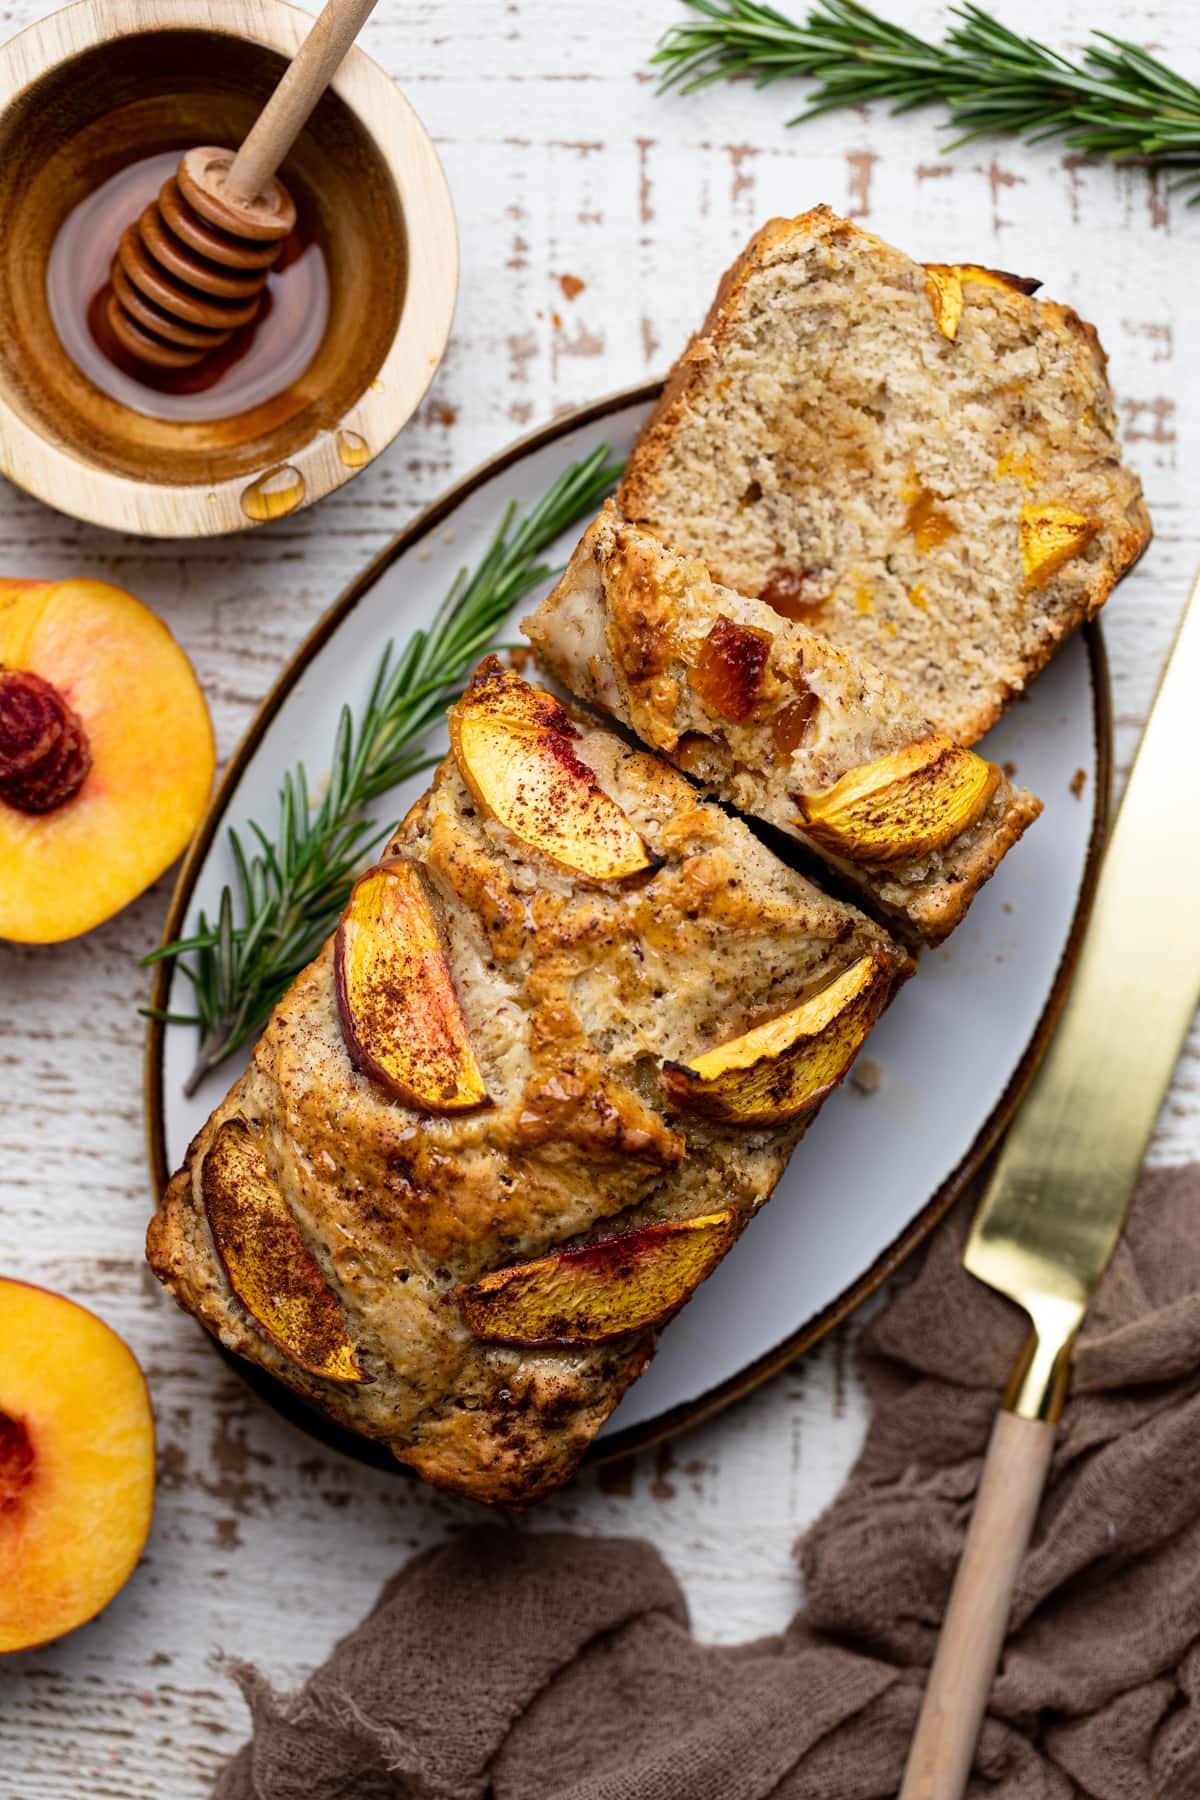 Cinnamon Maple Peach Bread